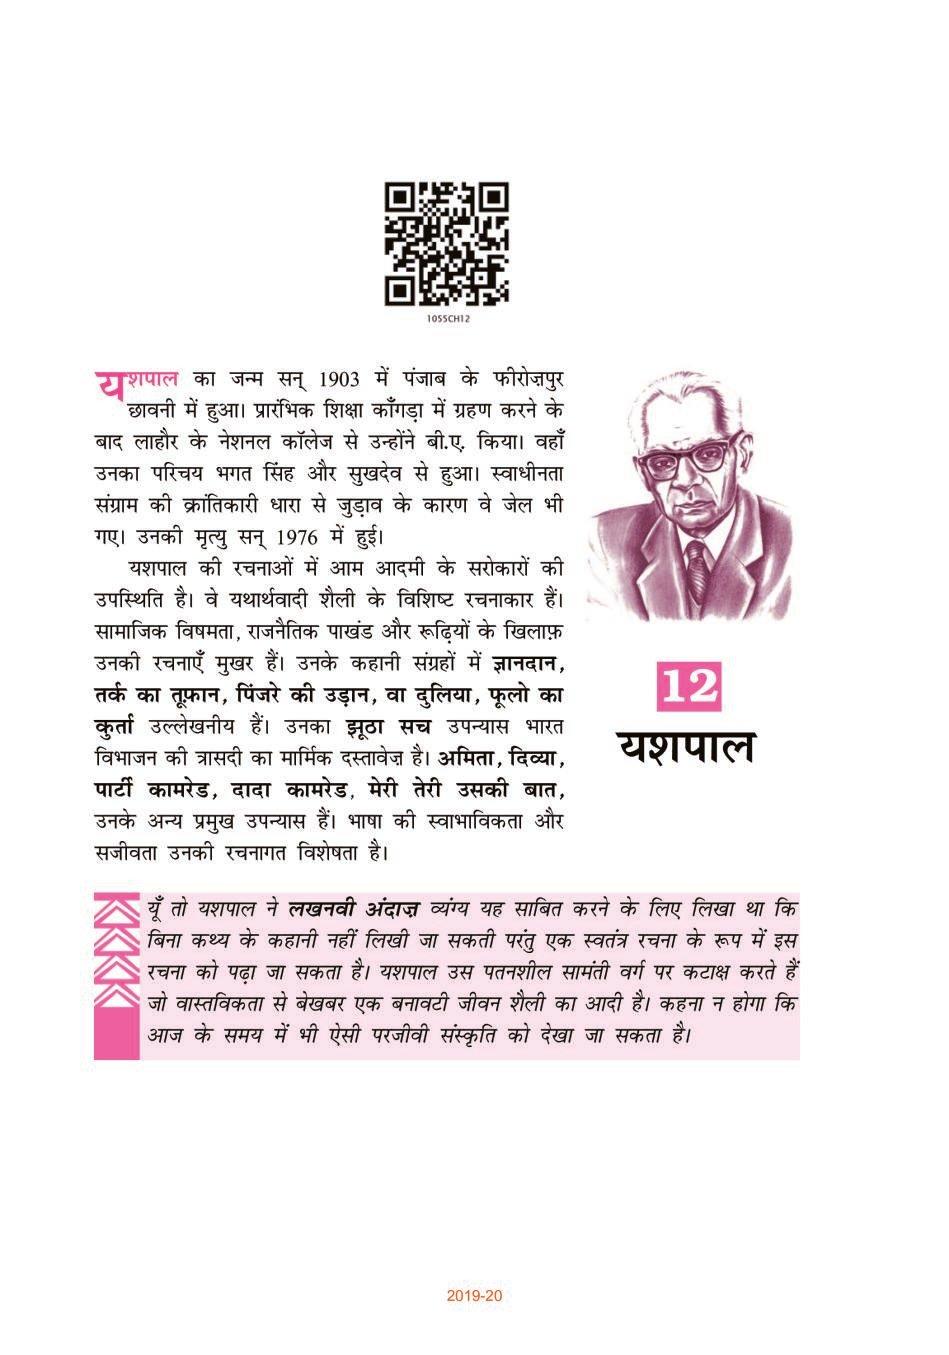 NCERT Book Class 10 Hindi (क्षितिज) Chapter 12 लखनवी अंदाज - Page 1